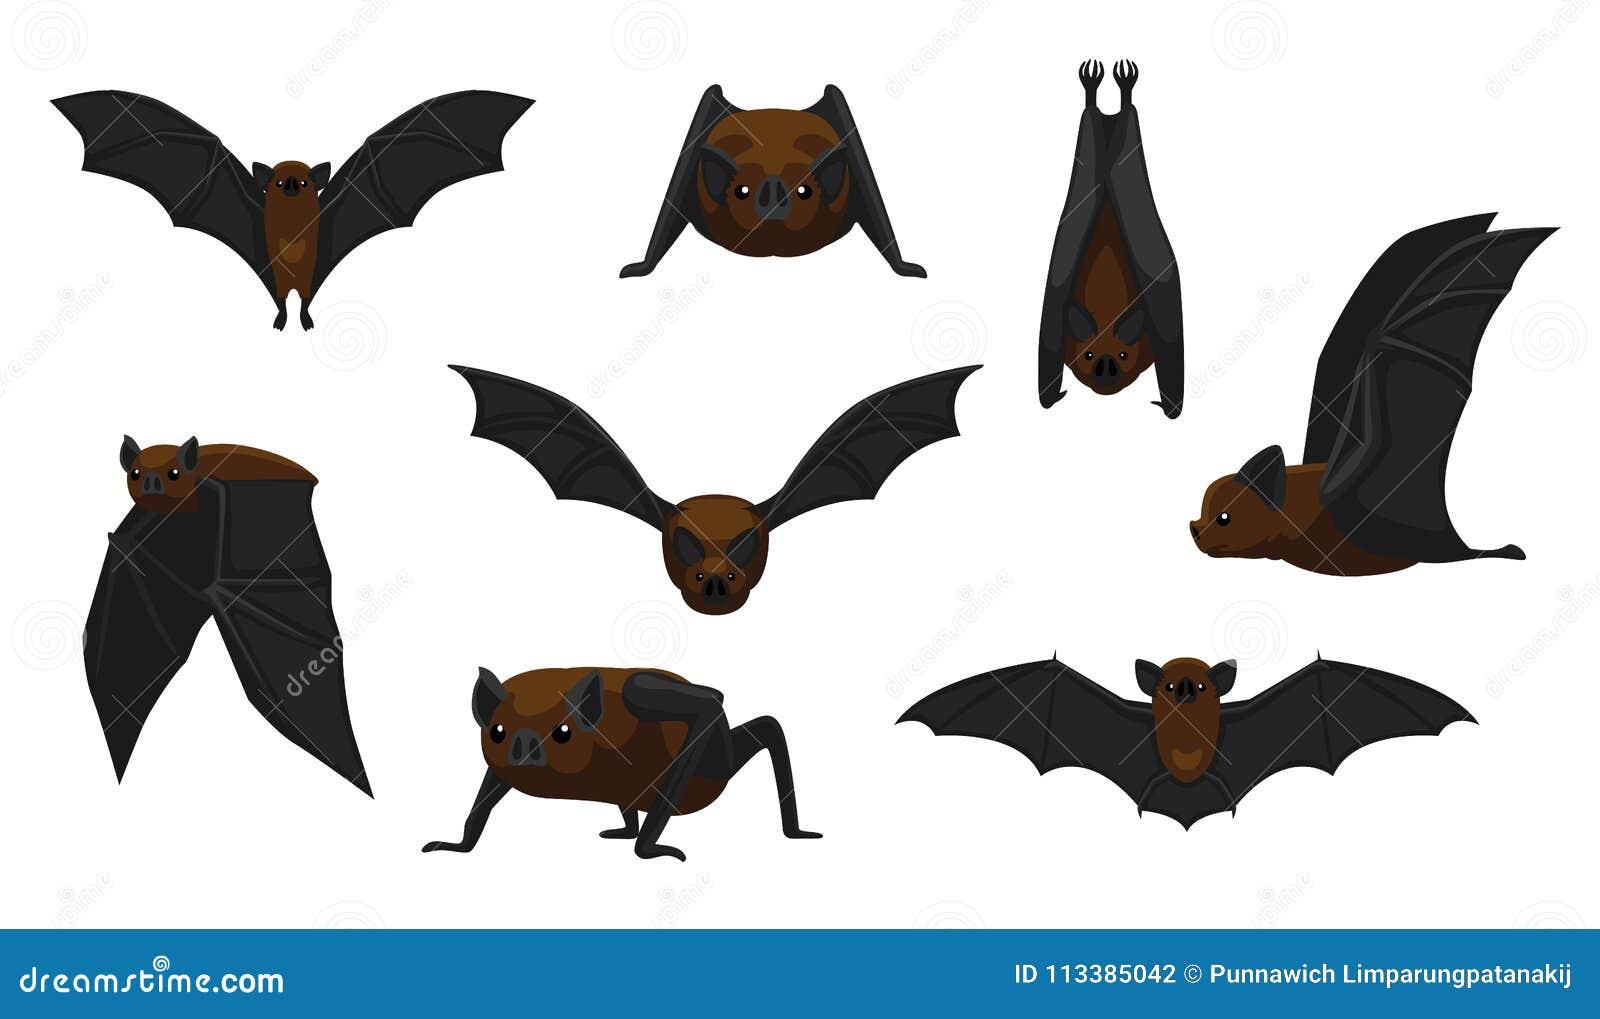 A Picture Of A Cartoon Bat vampire bat flying cartoon vector illustration stock vector